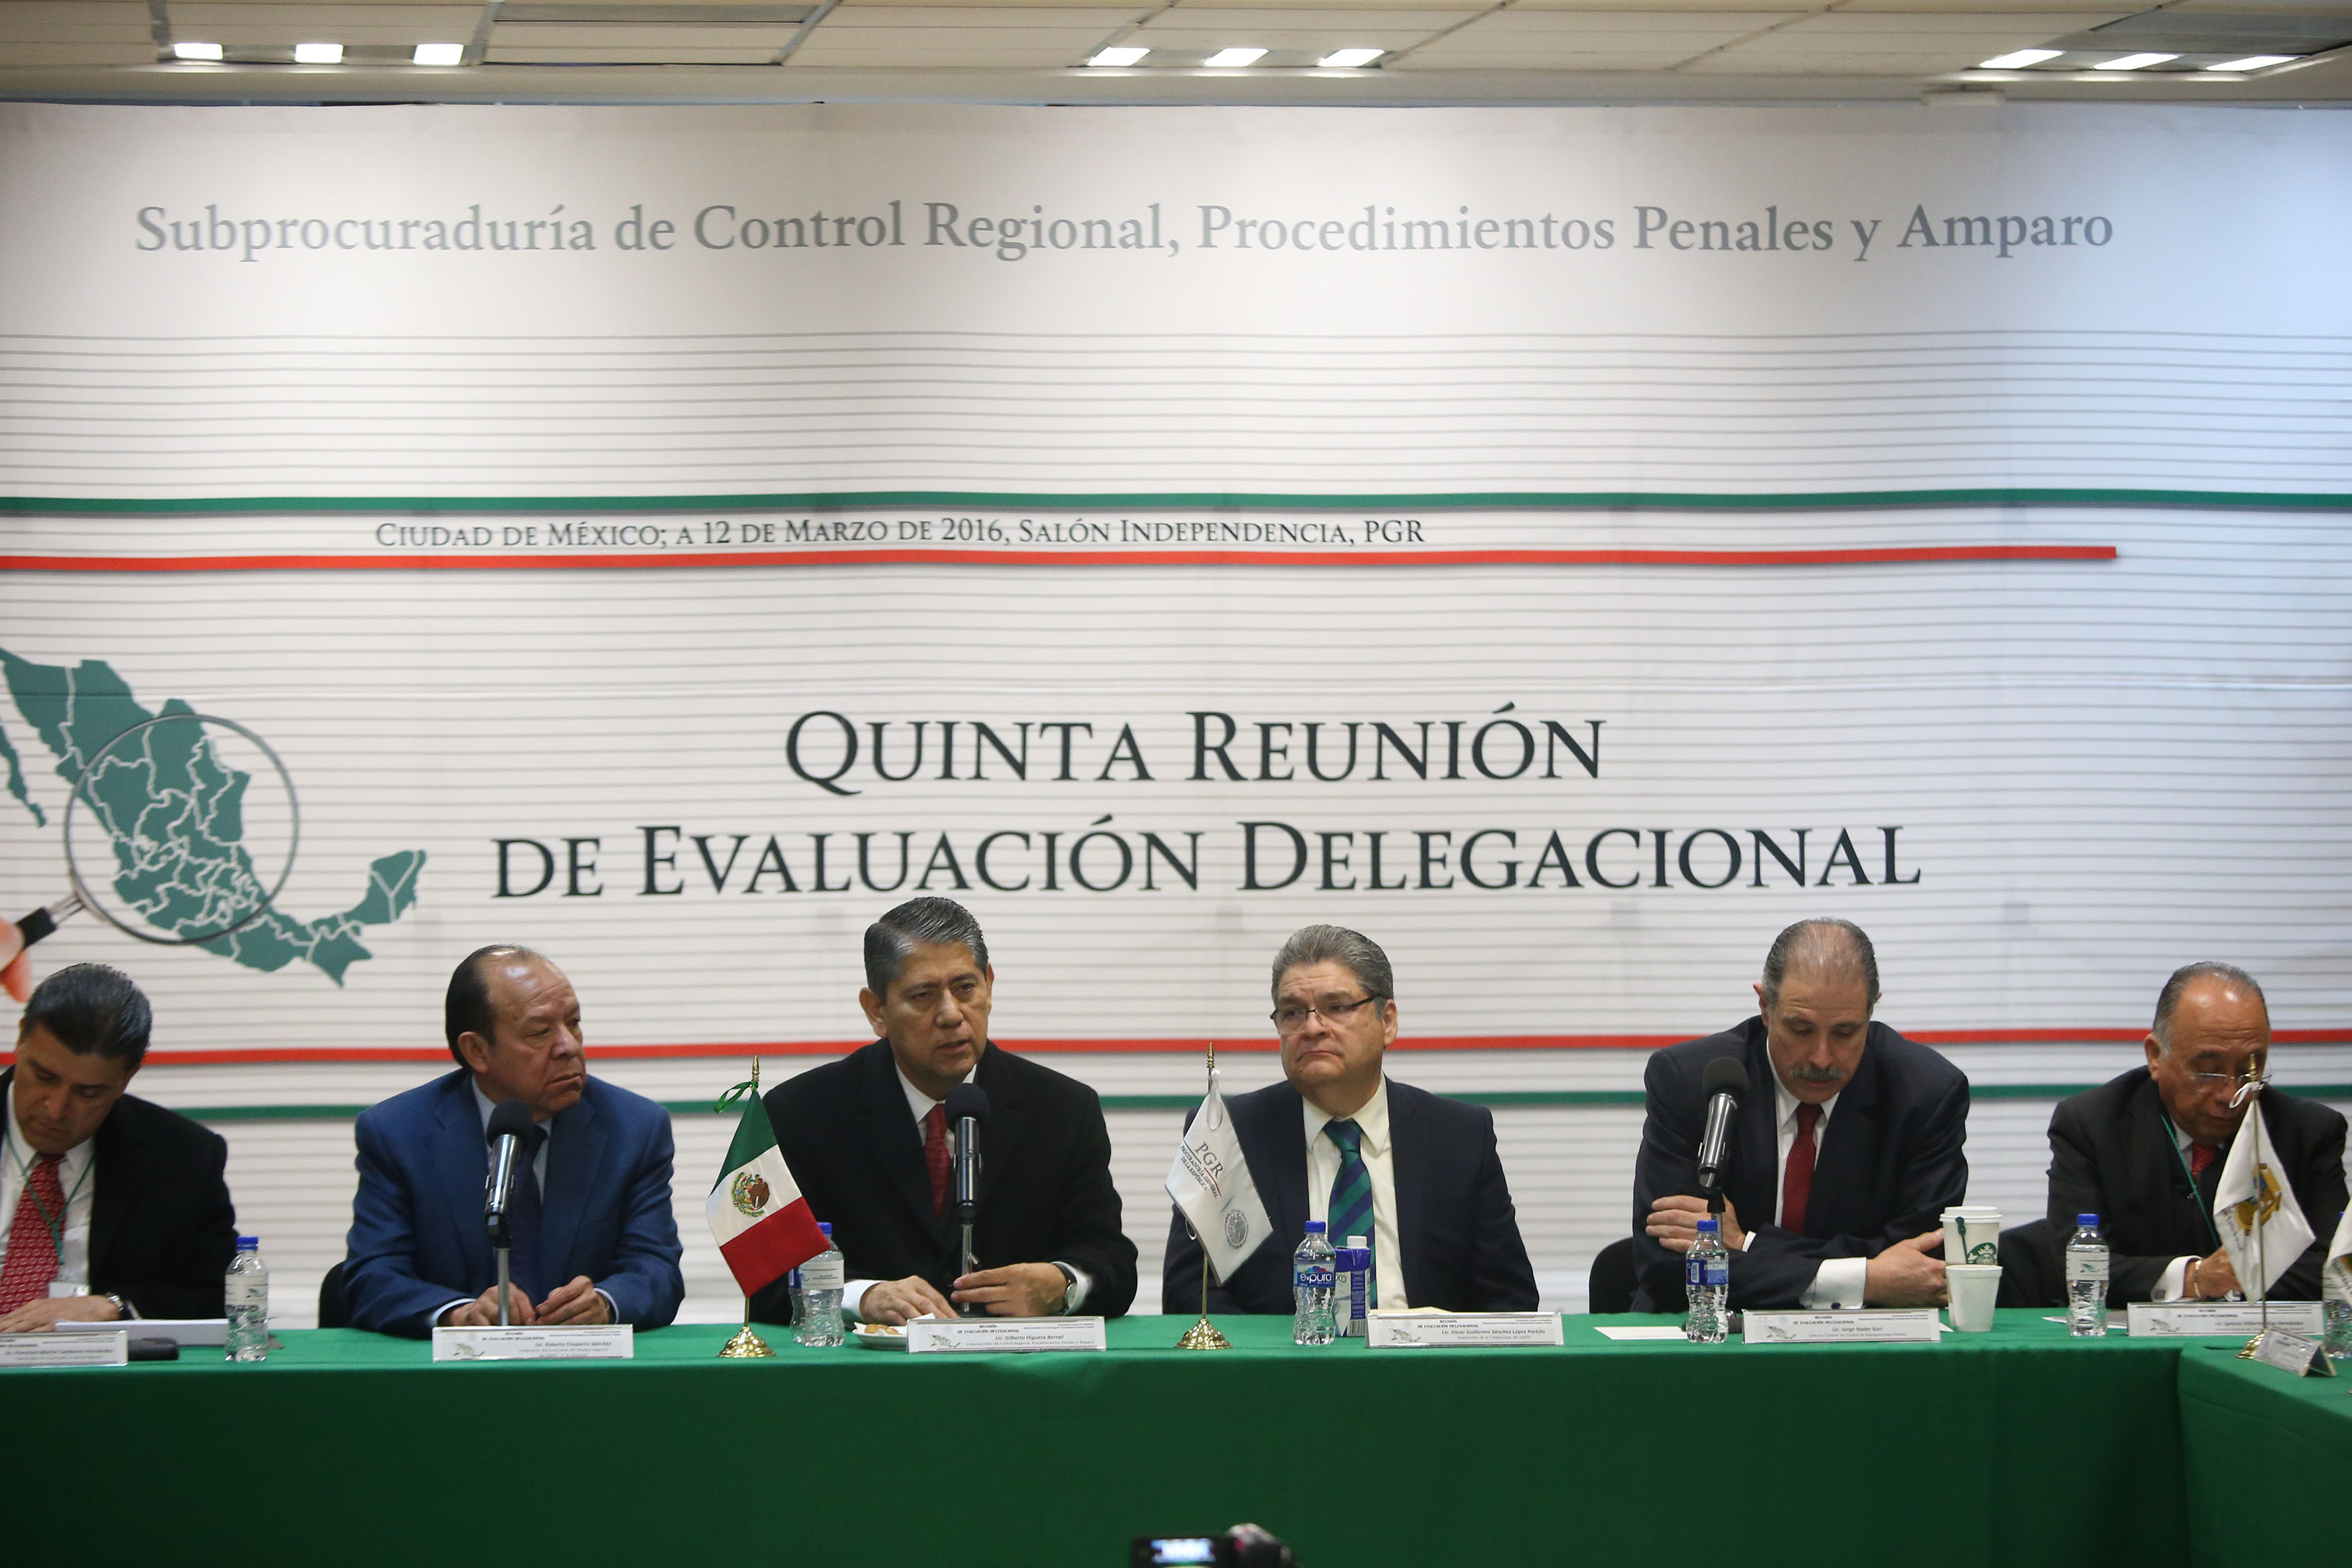 12 03 16 5a Reunio n delegacional PGR16.jpg